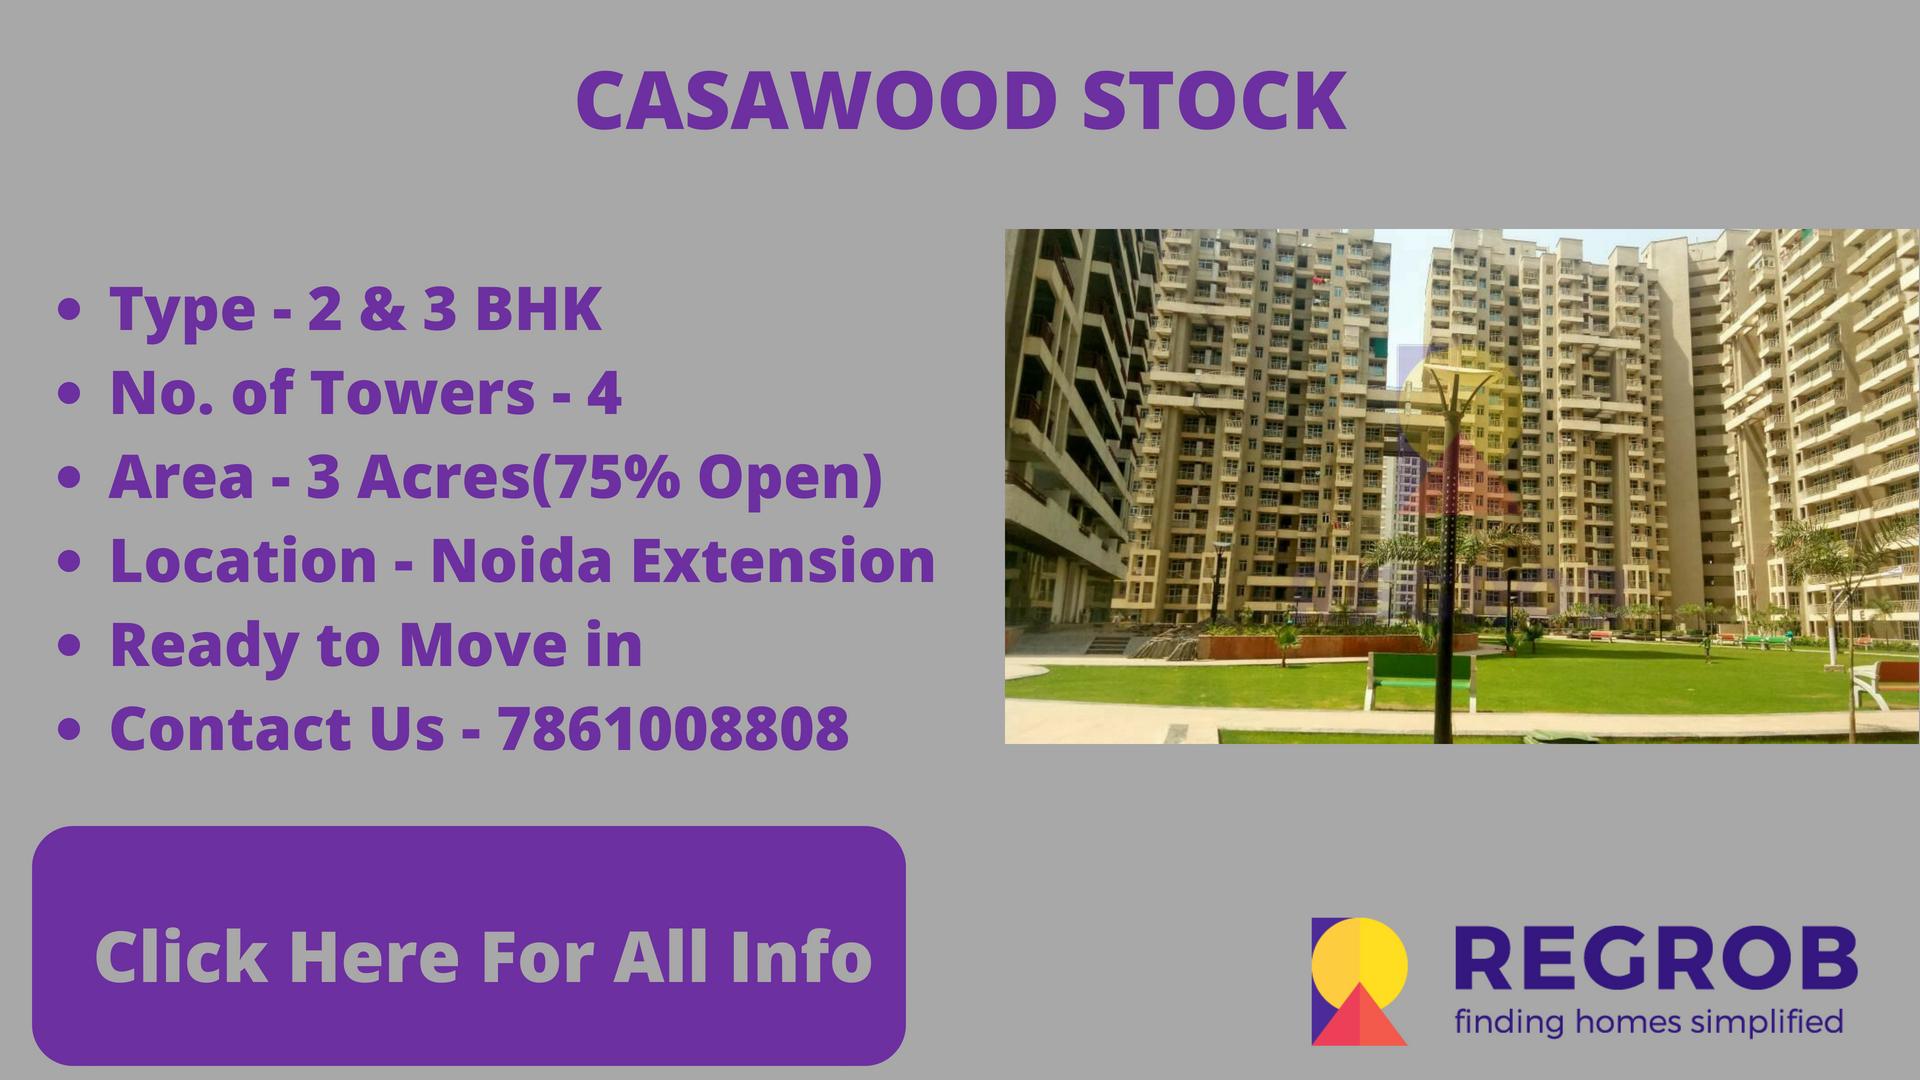 Casawood Stock gaur city 2